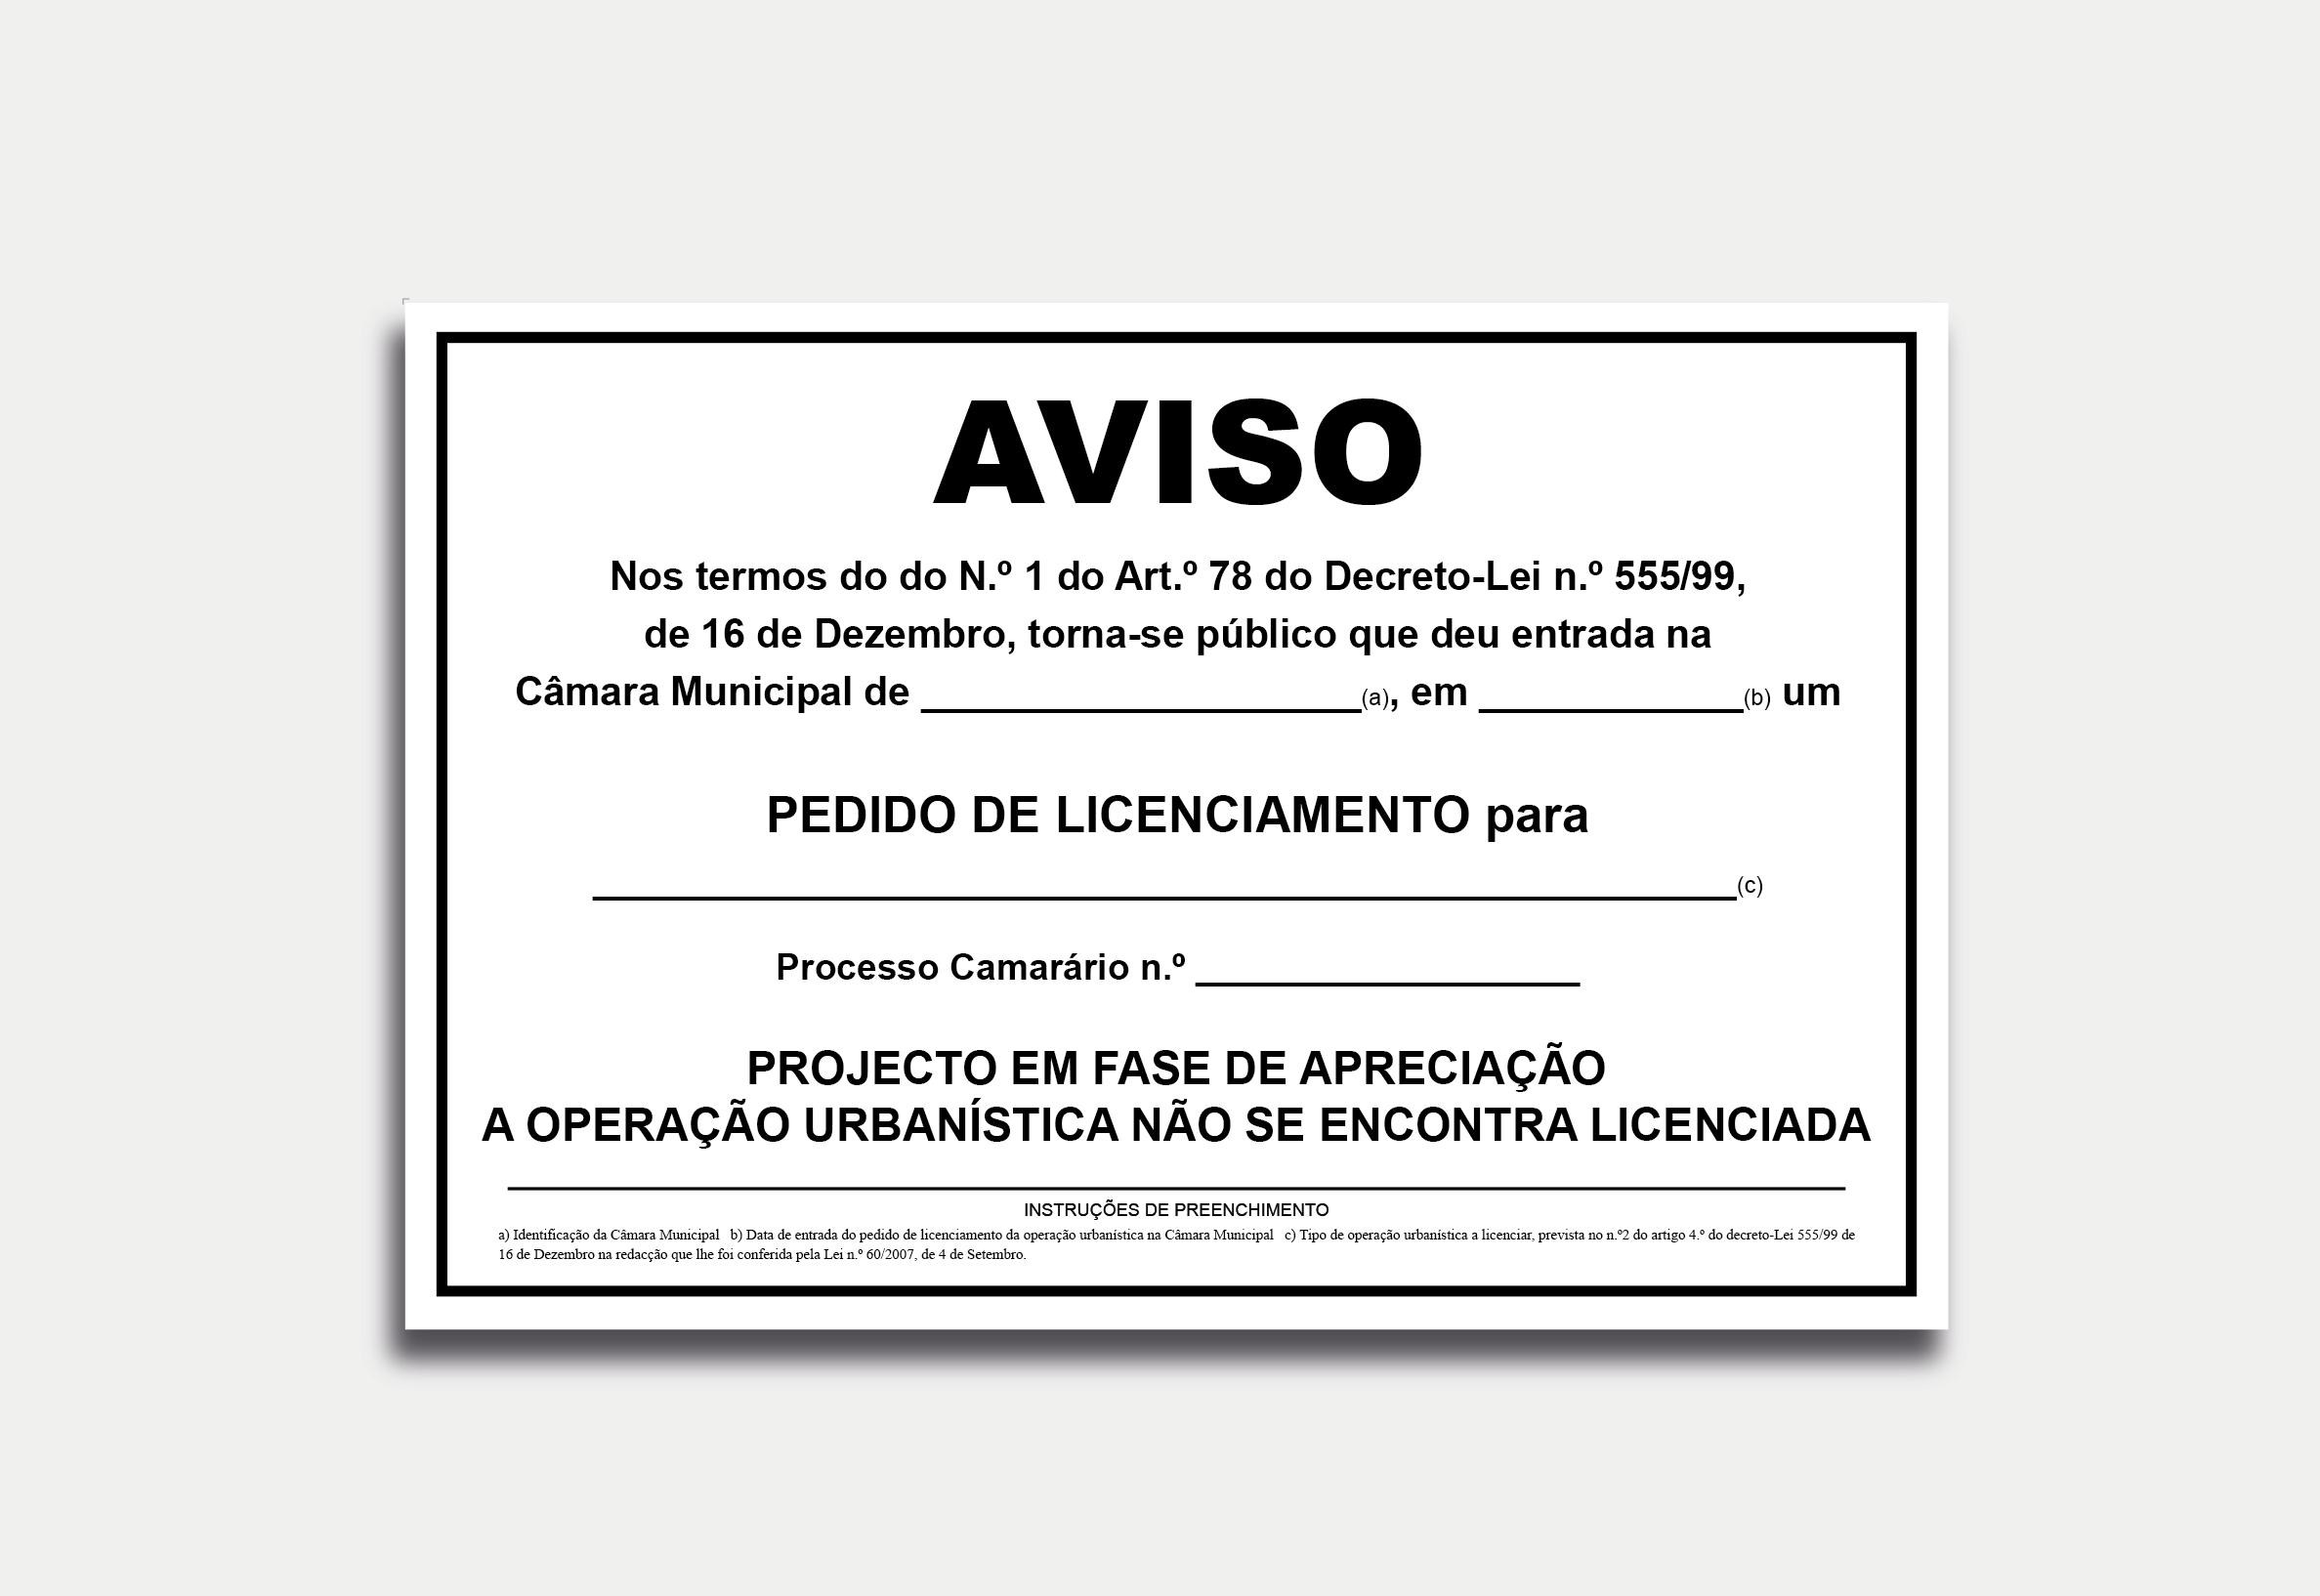 Licenciamento MOD-940